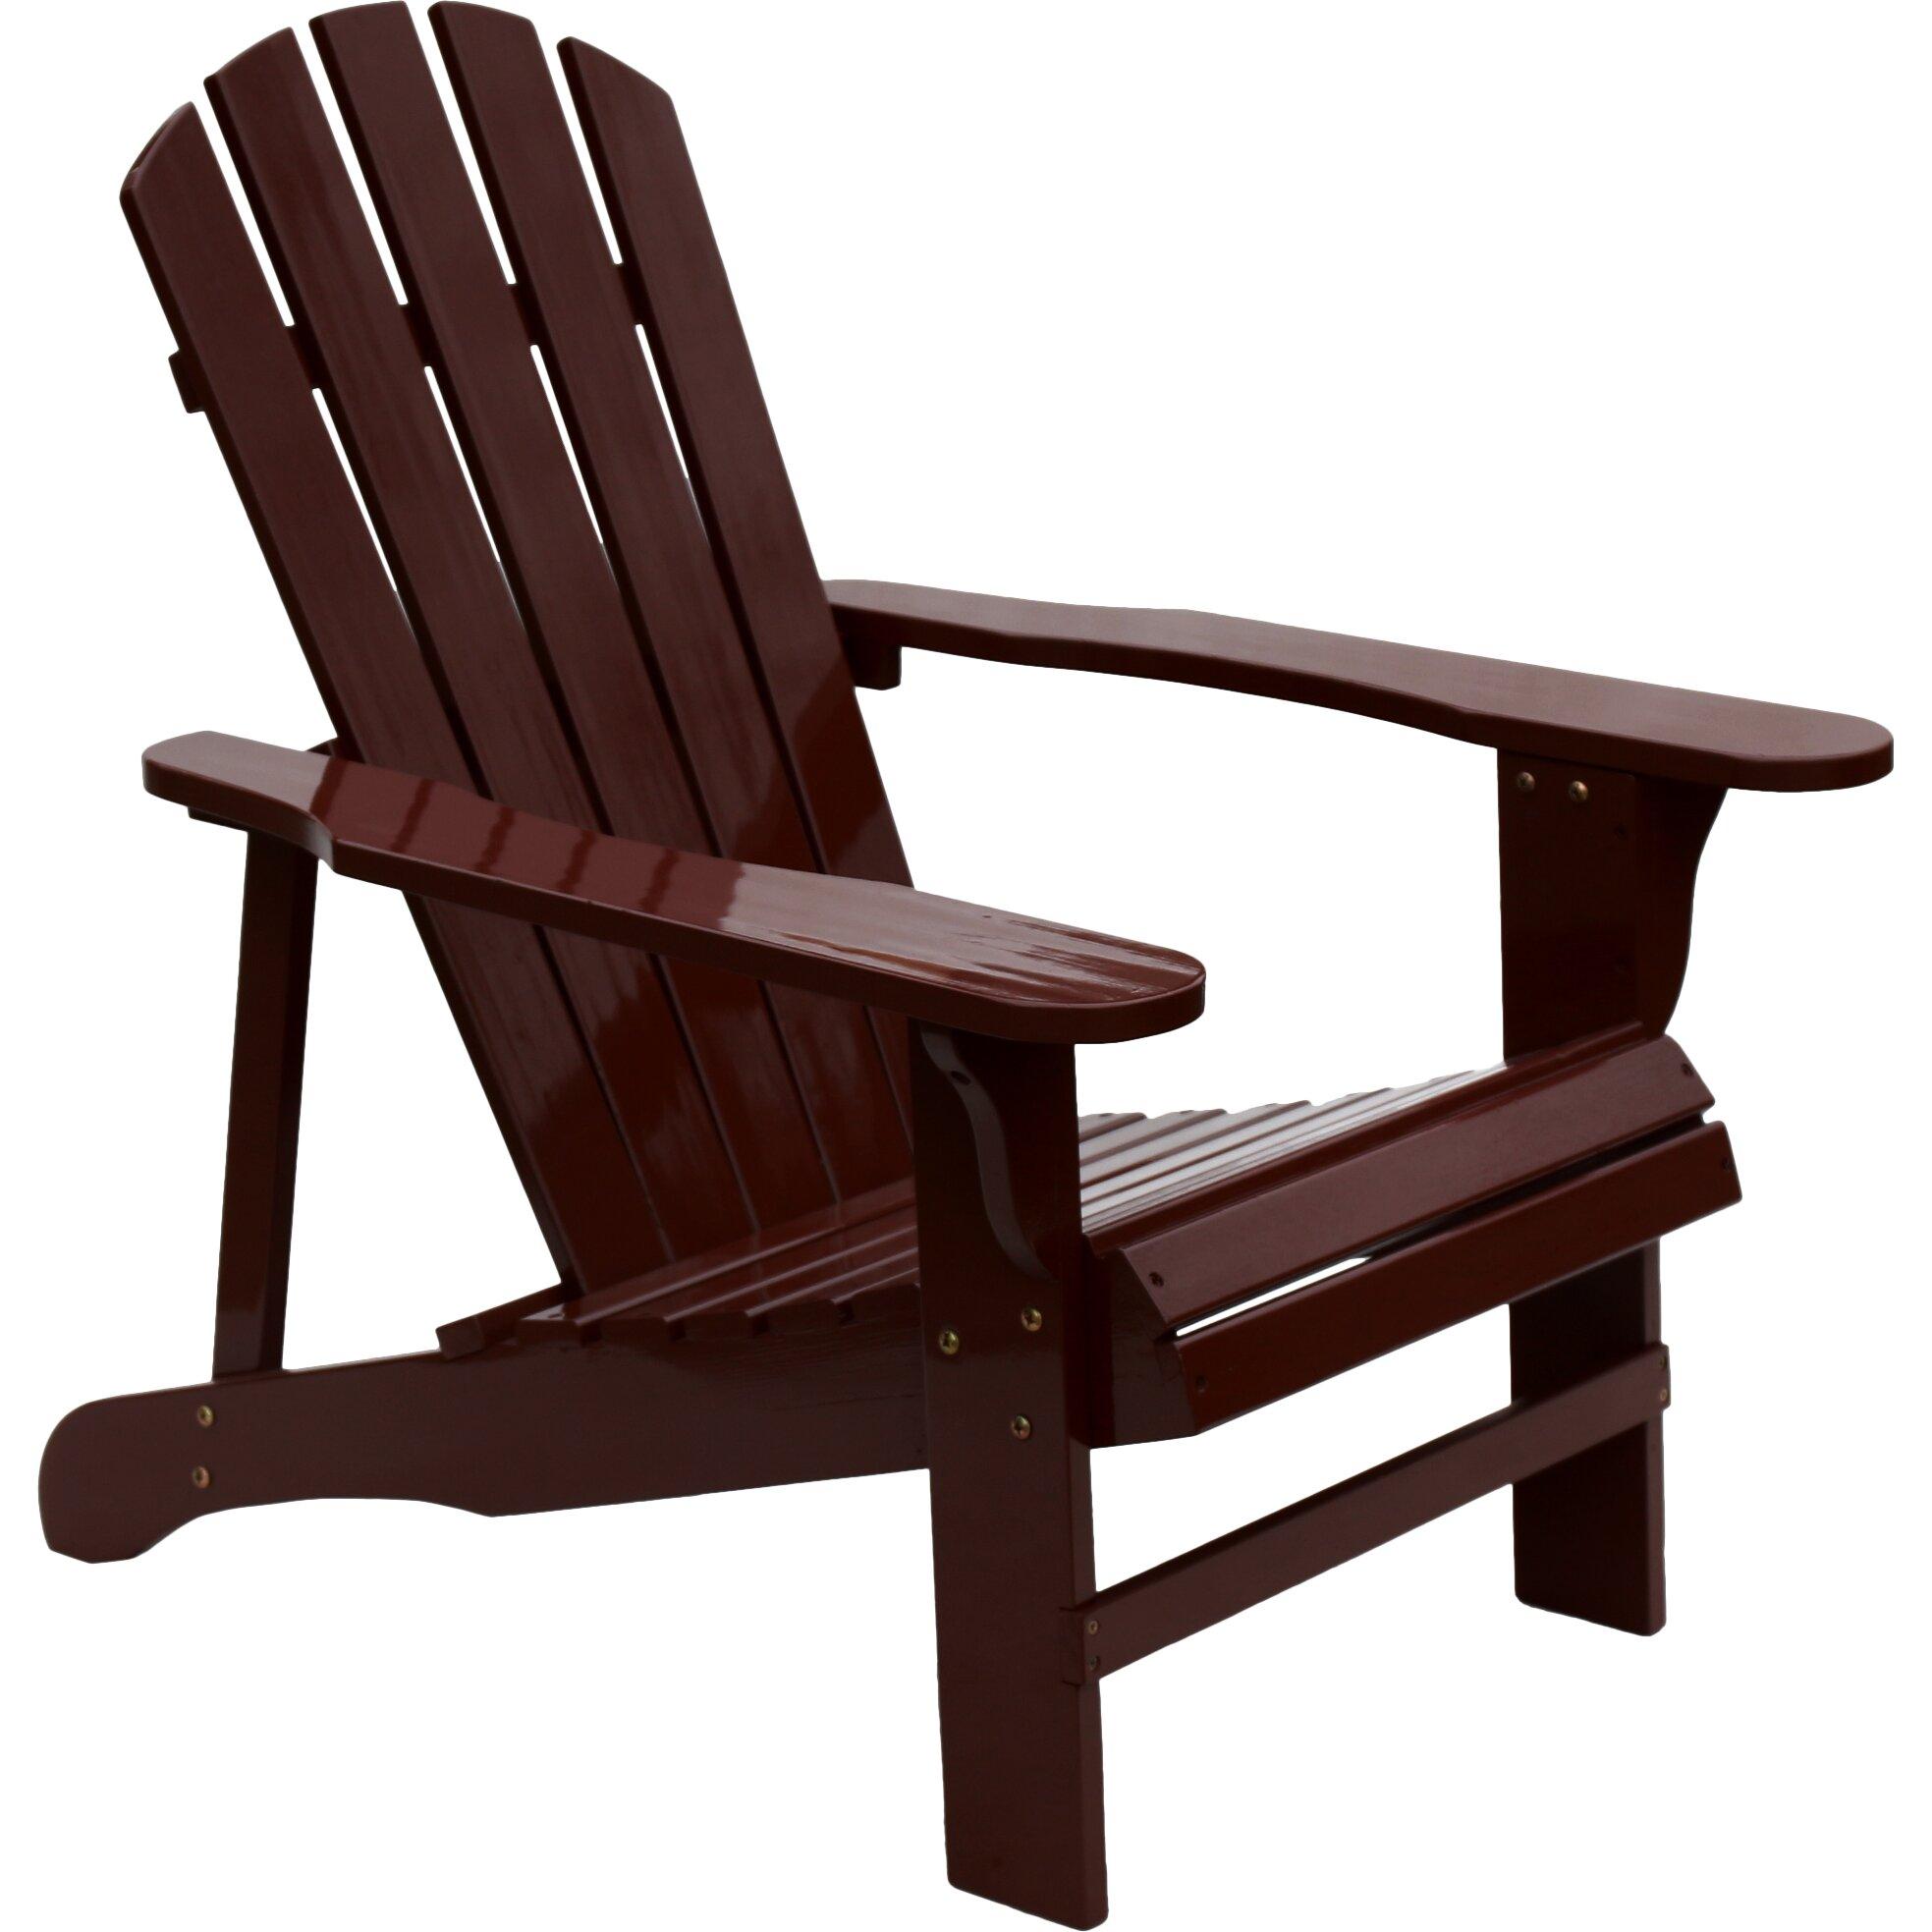 Hrh designs adirondack chair reviews wayfair for Adirondack chairs design